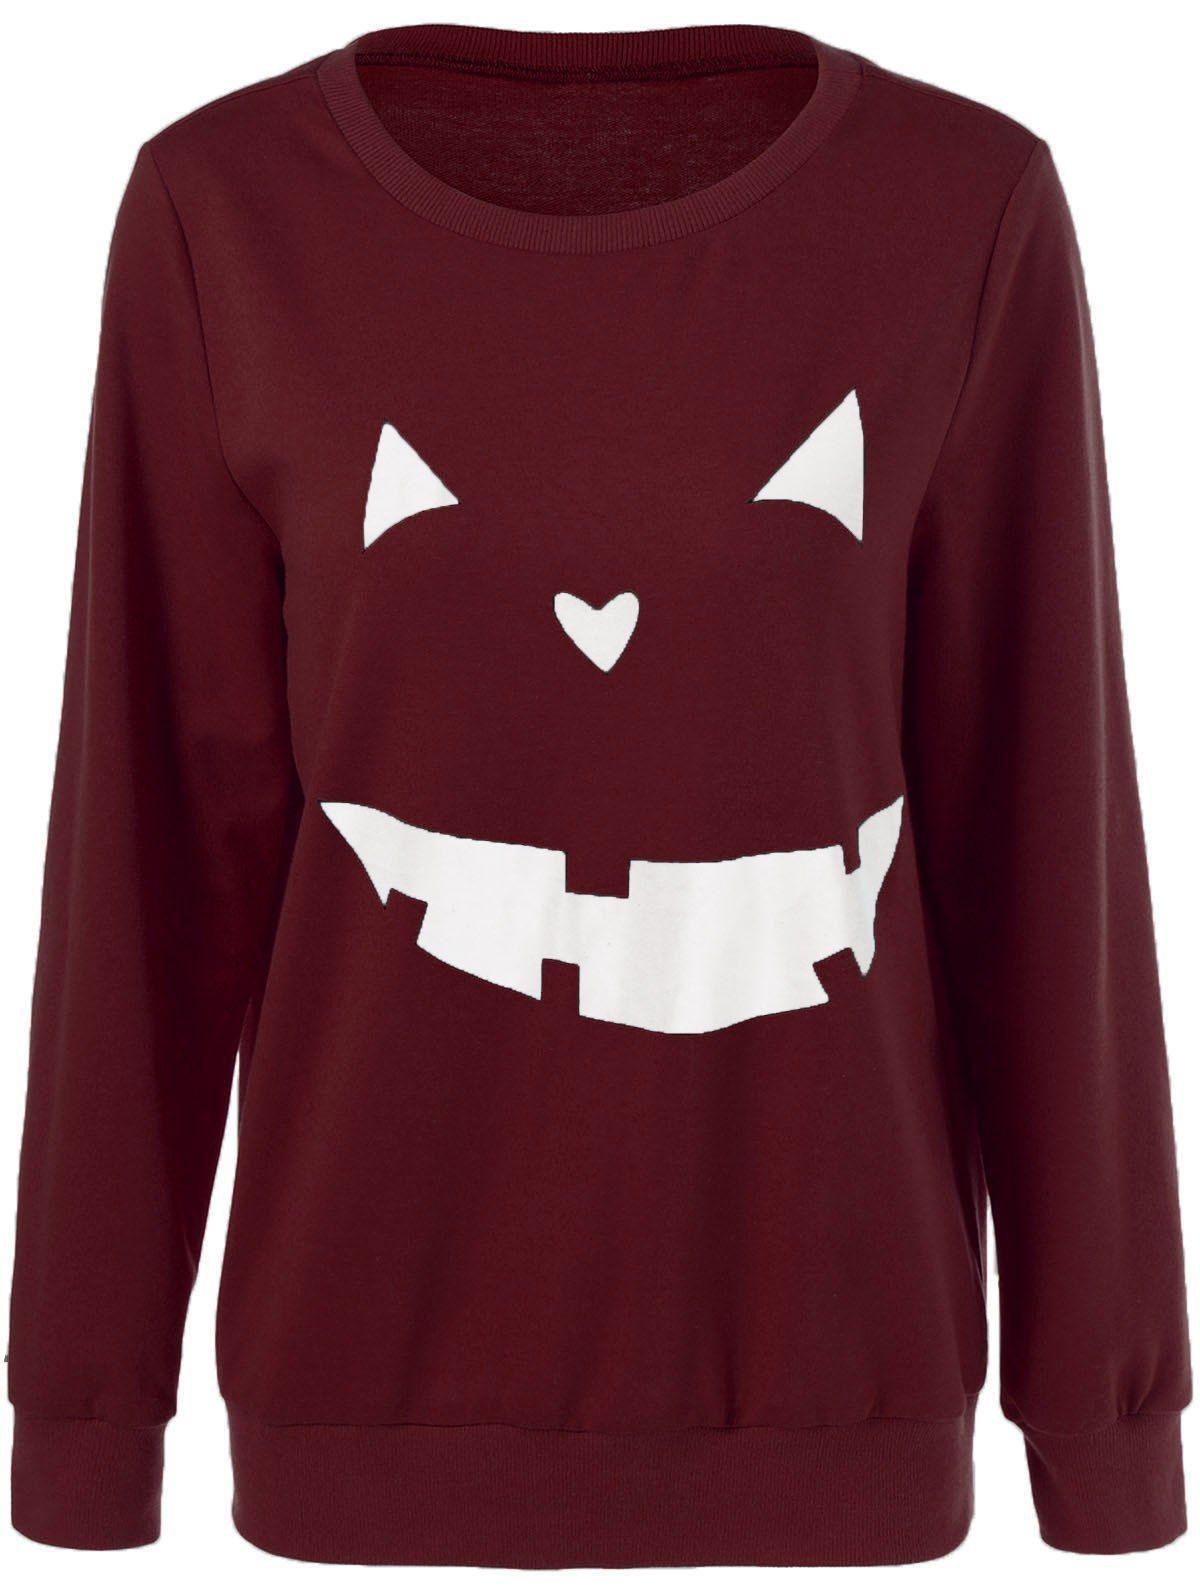 Only 969 For Halloween Grimace Sweatshirt In Wine Red Sammydress